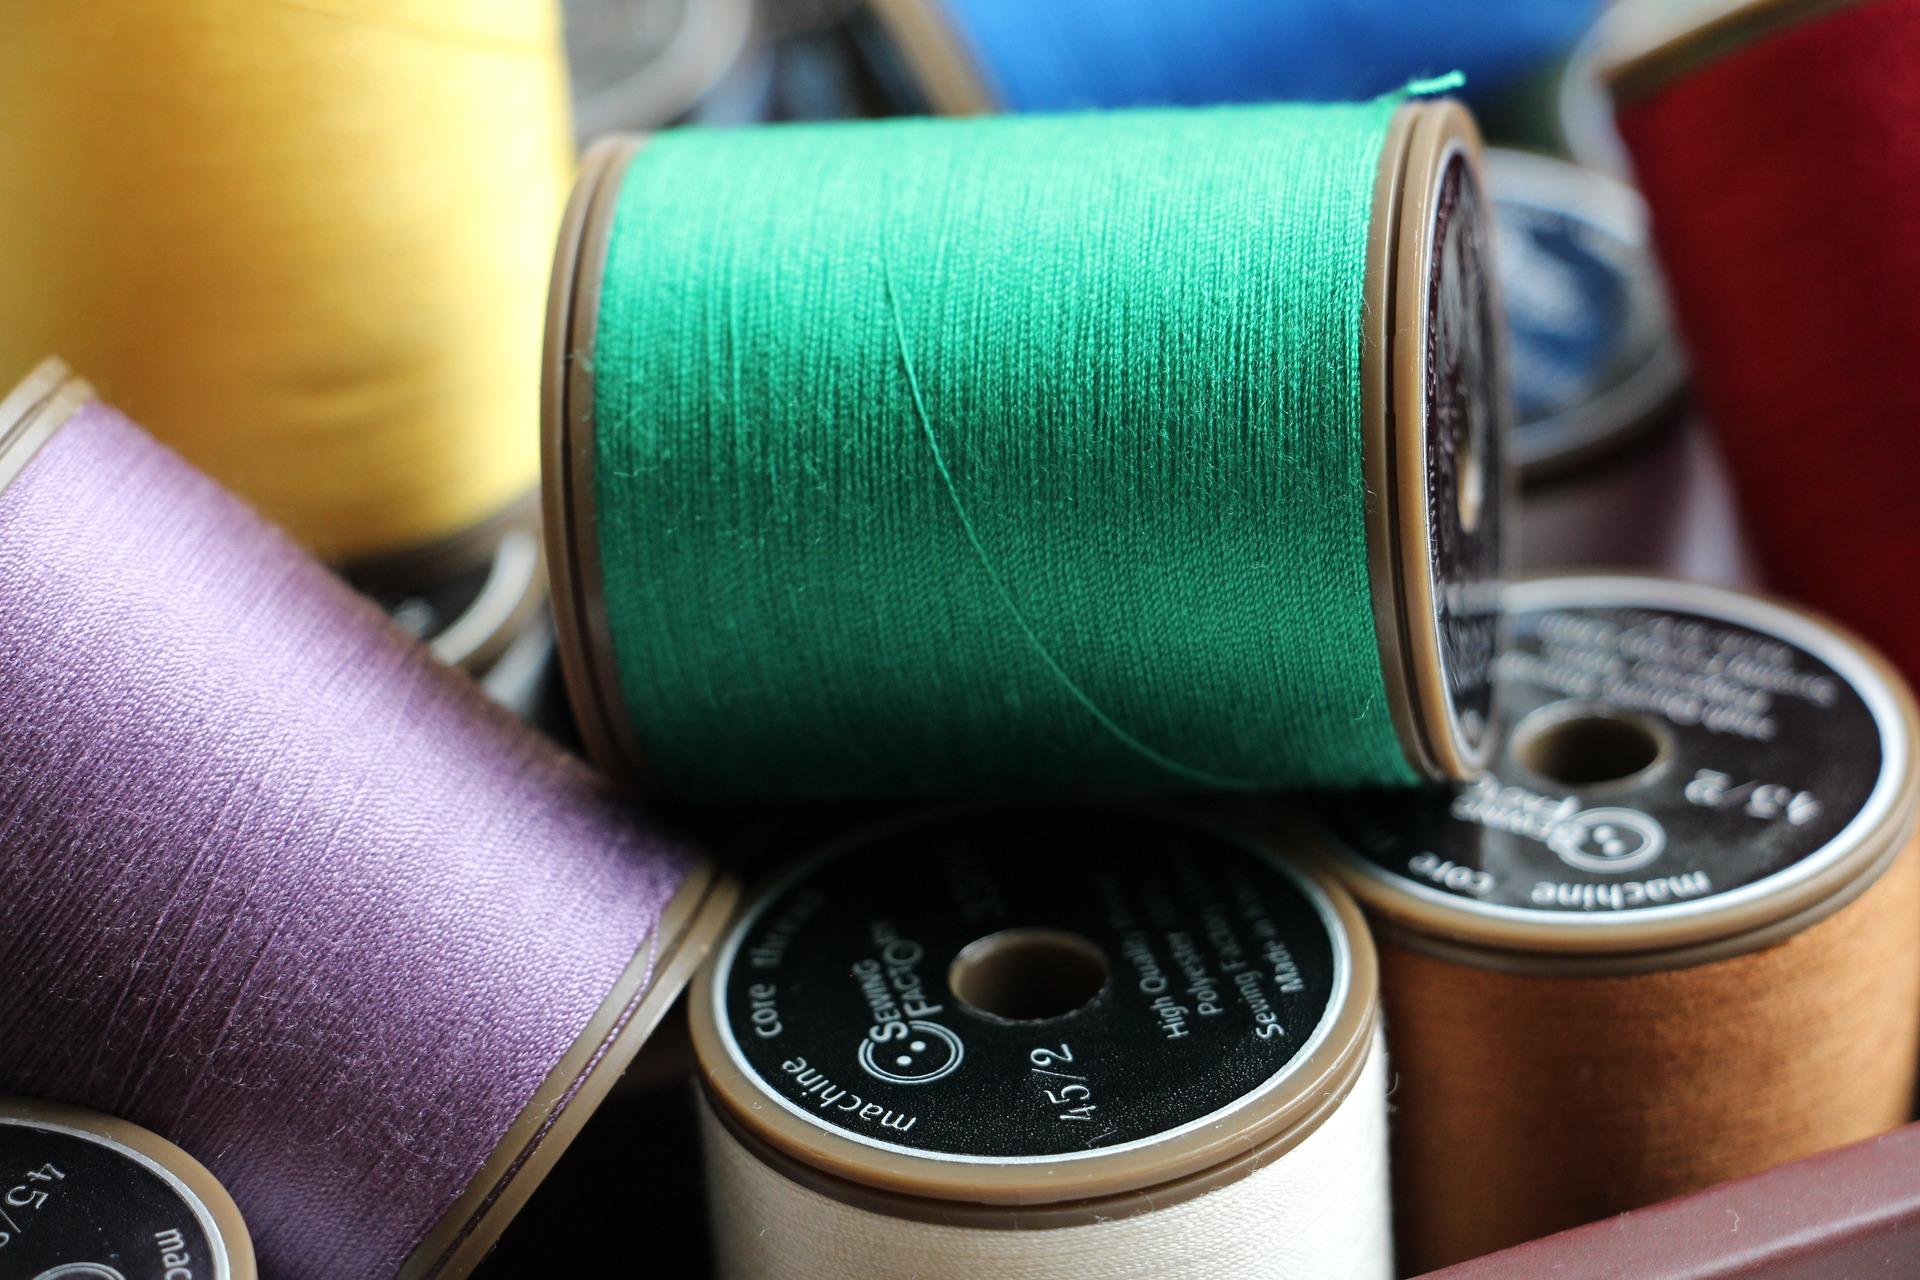 thread-1383260_1920